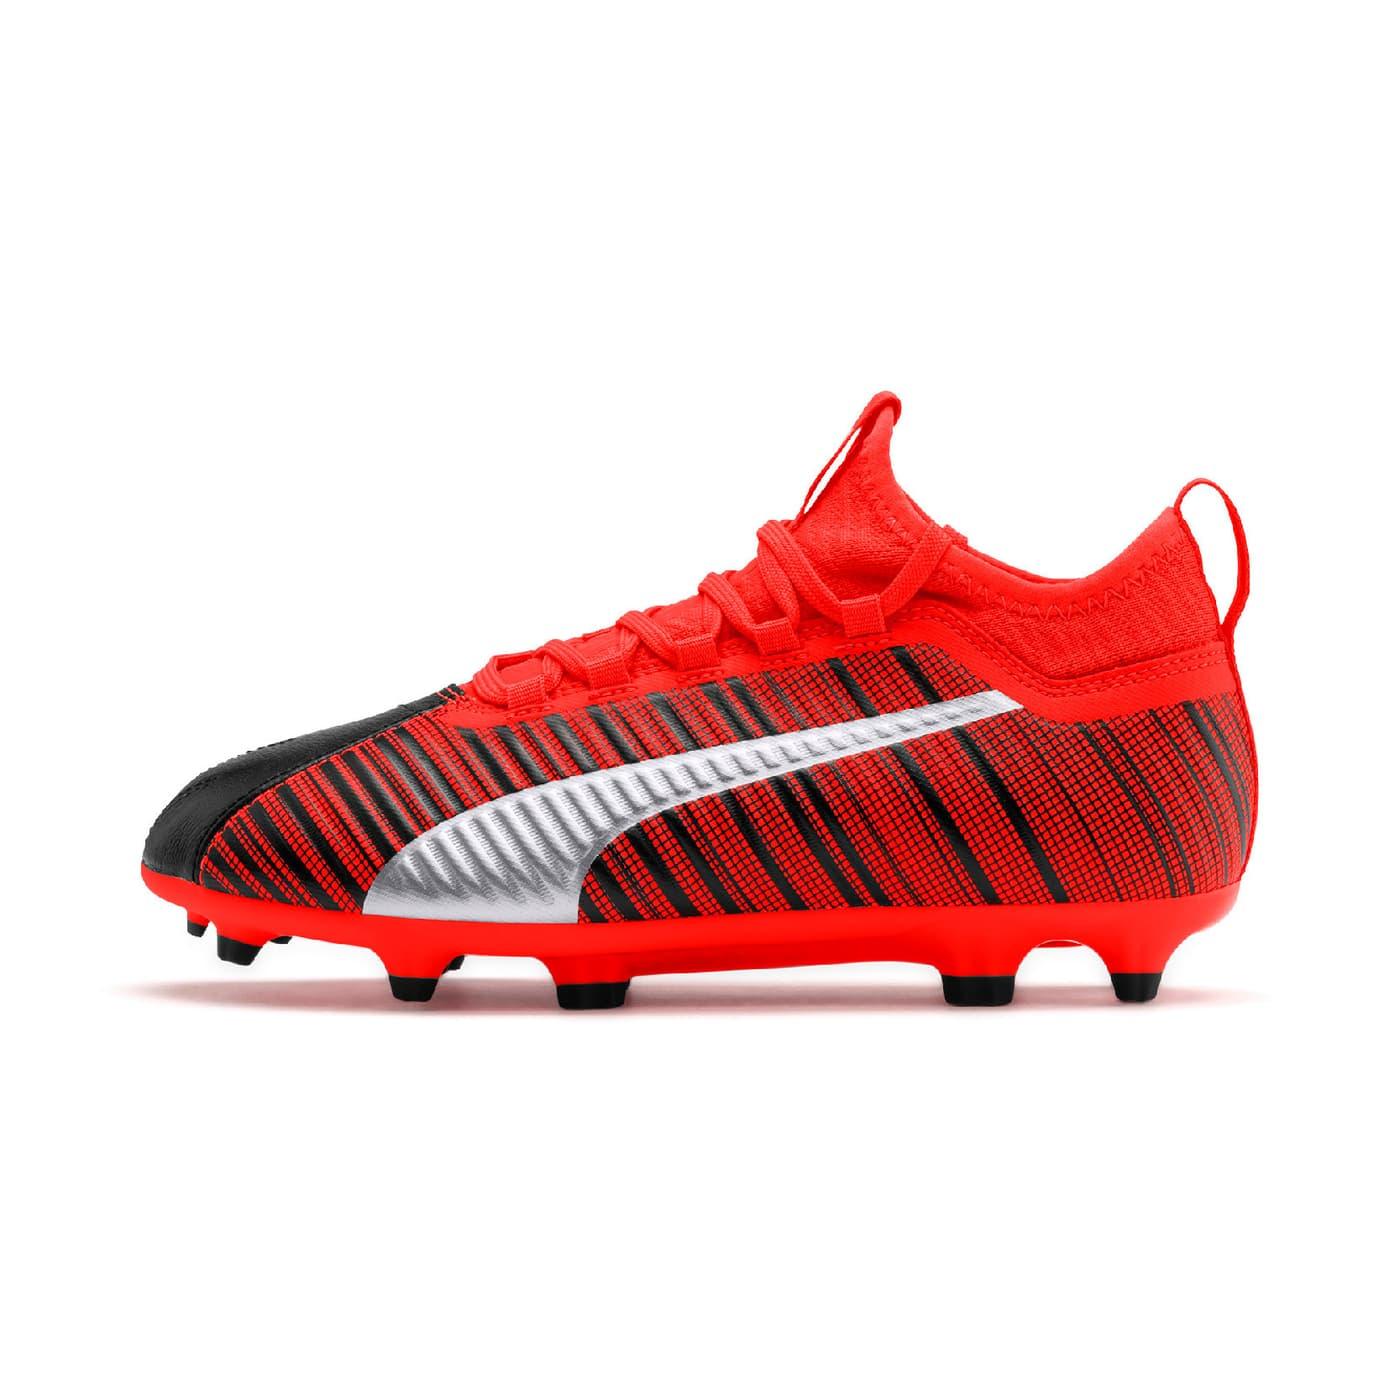 Puma One 5.3 FGAG Chaussures de football pour enfant